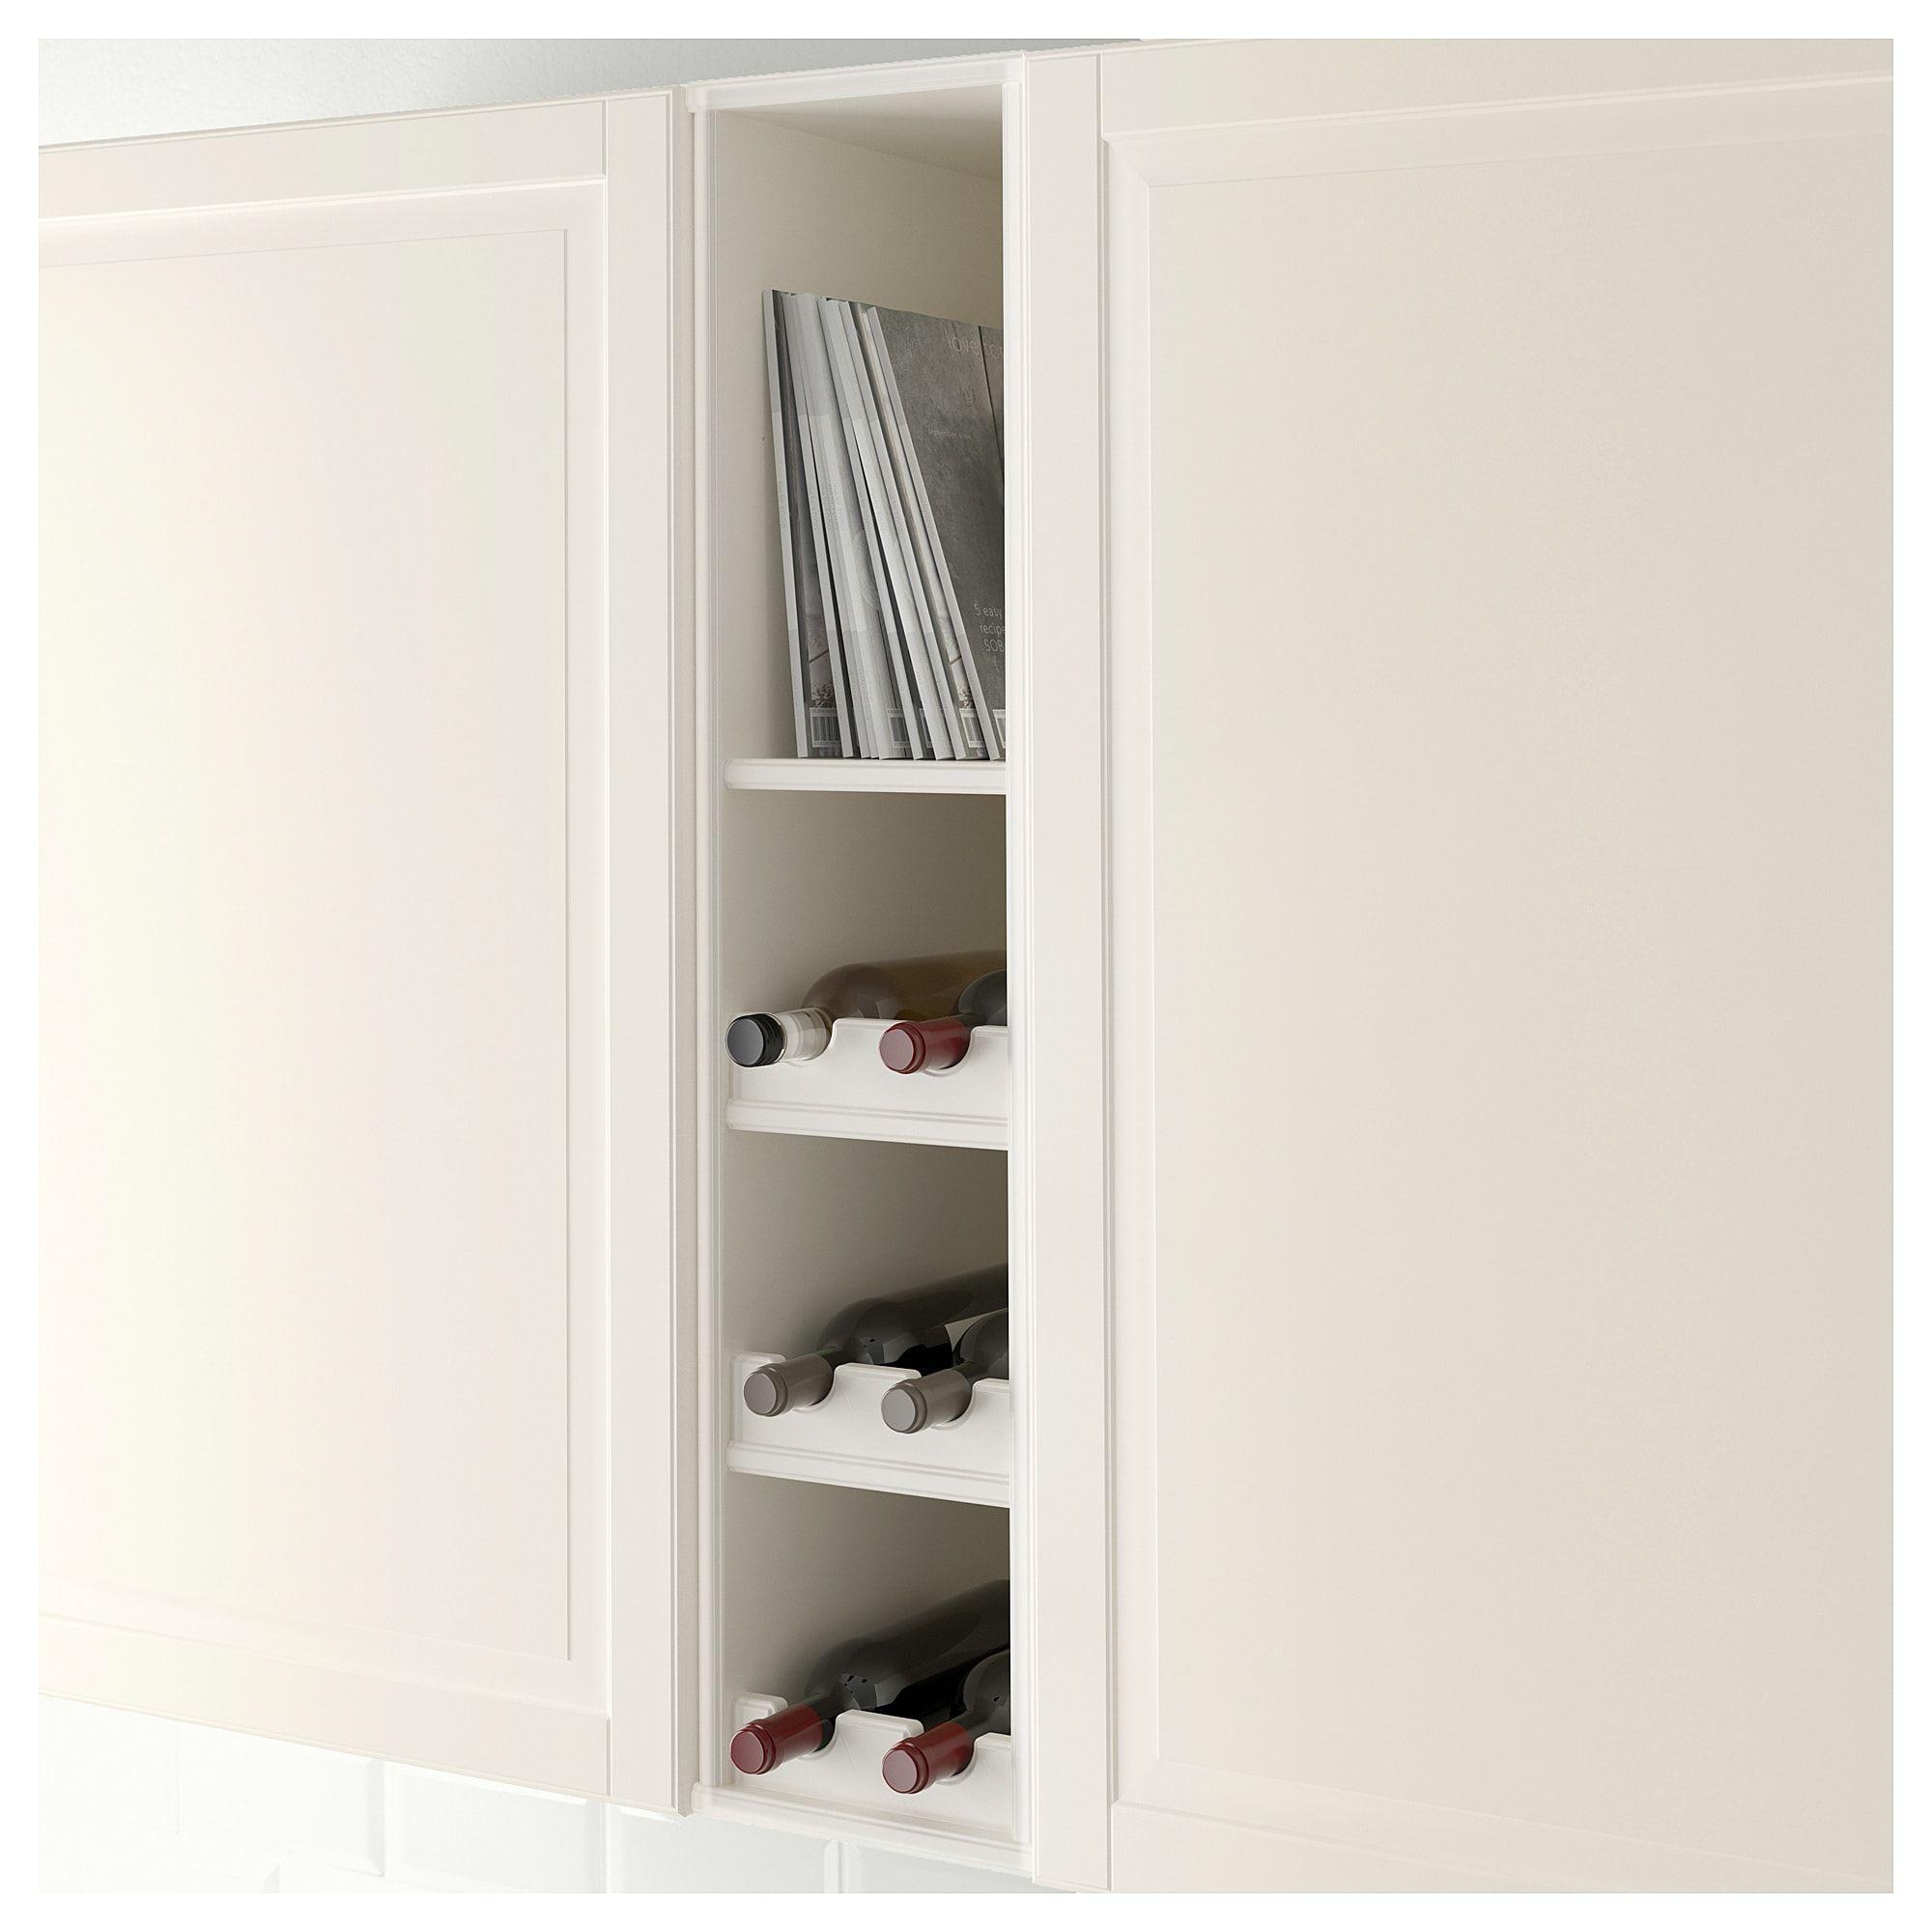 open cabinet tornviken off white house open cabinets cabinet rh pinterest com